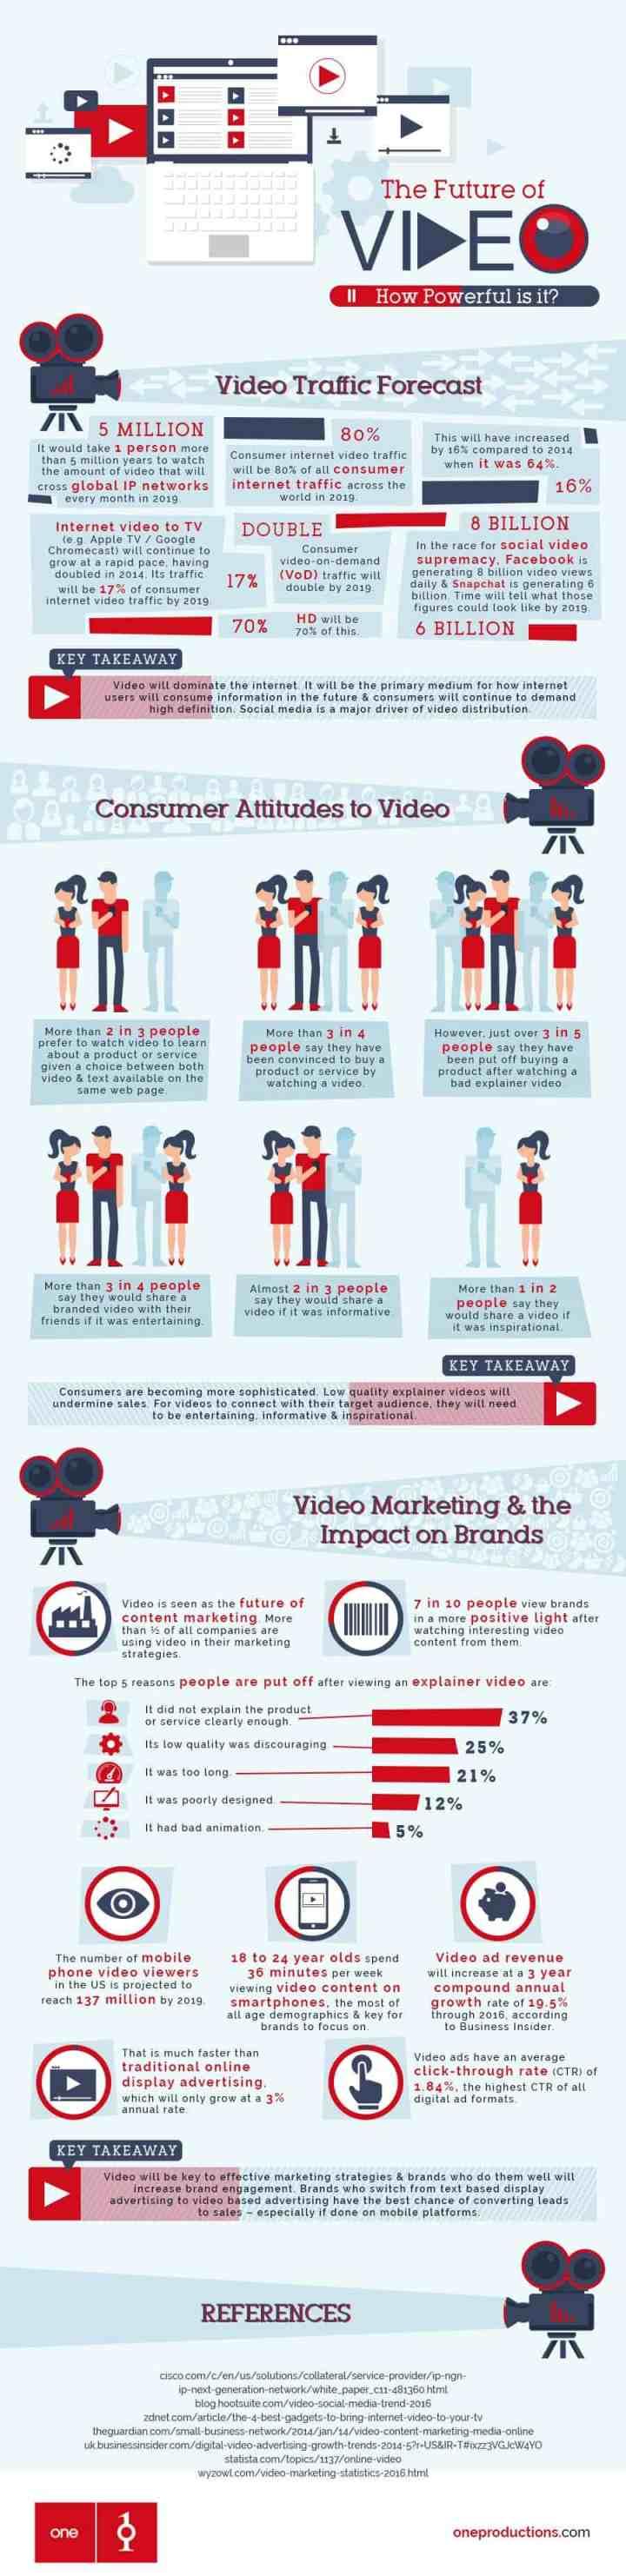 video-infographic-full